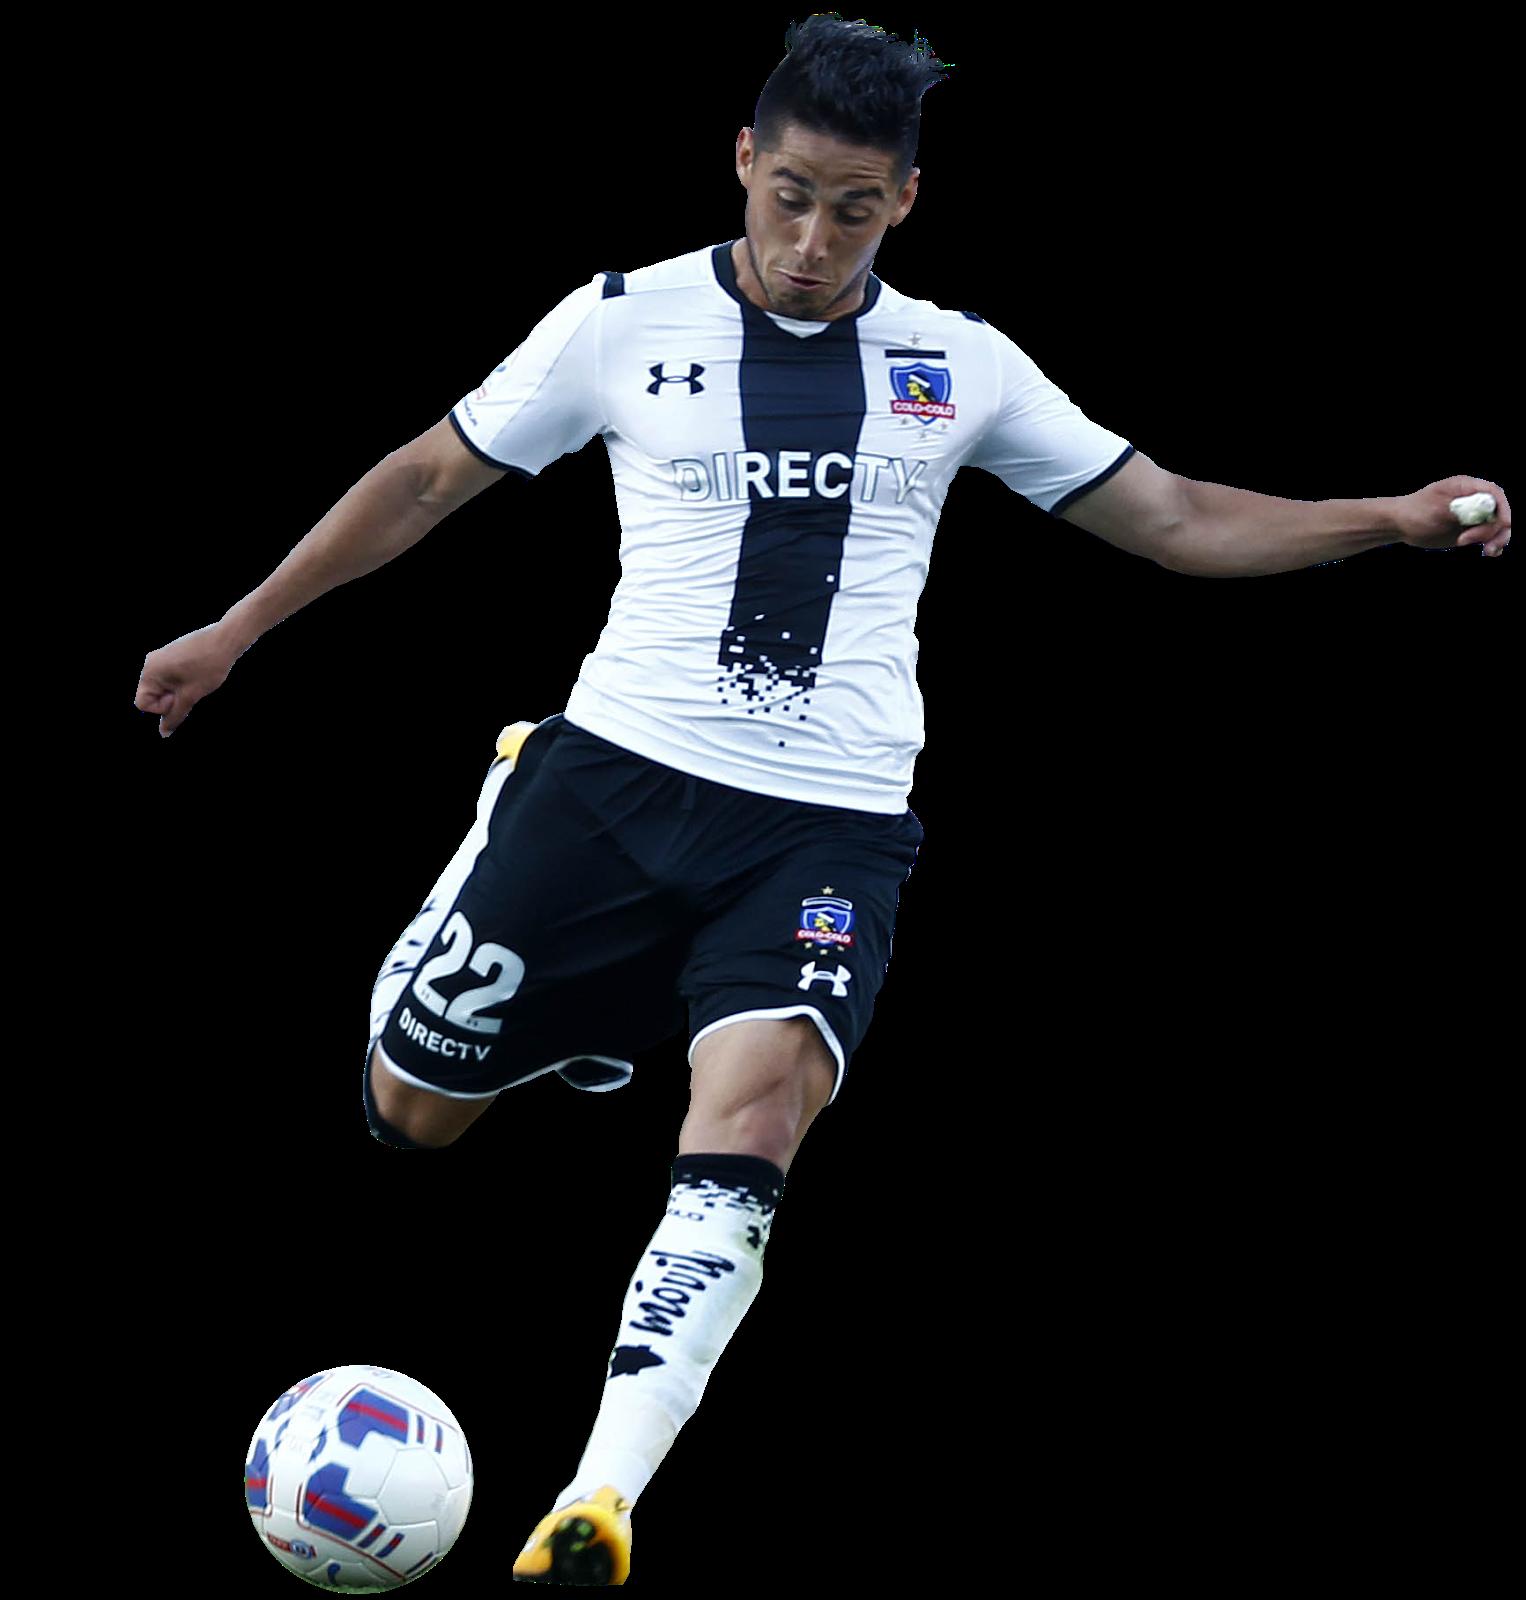 Juan Delgadorender